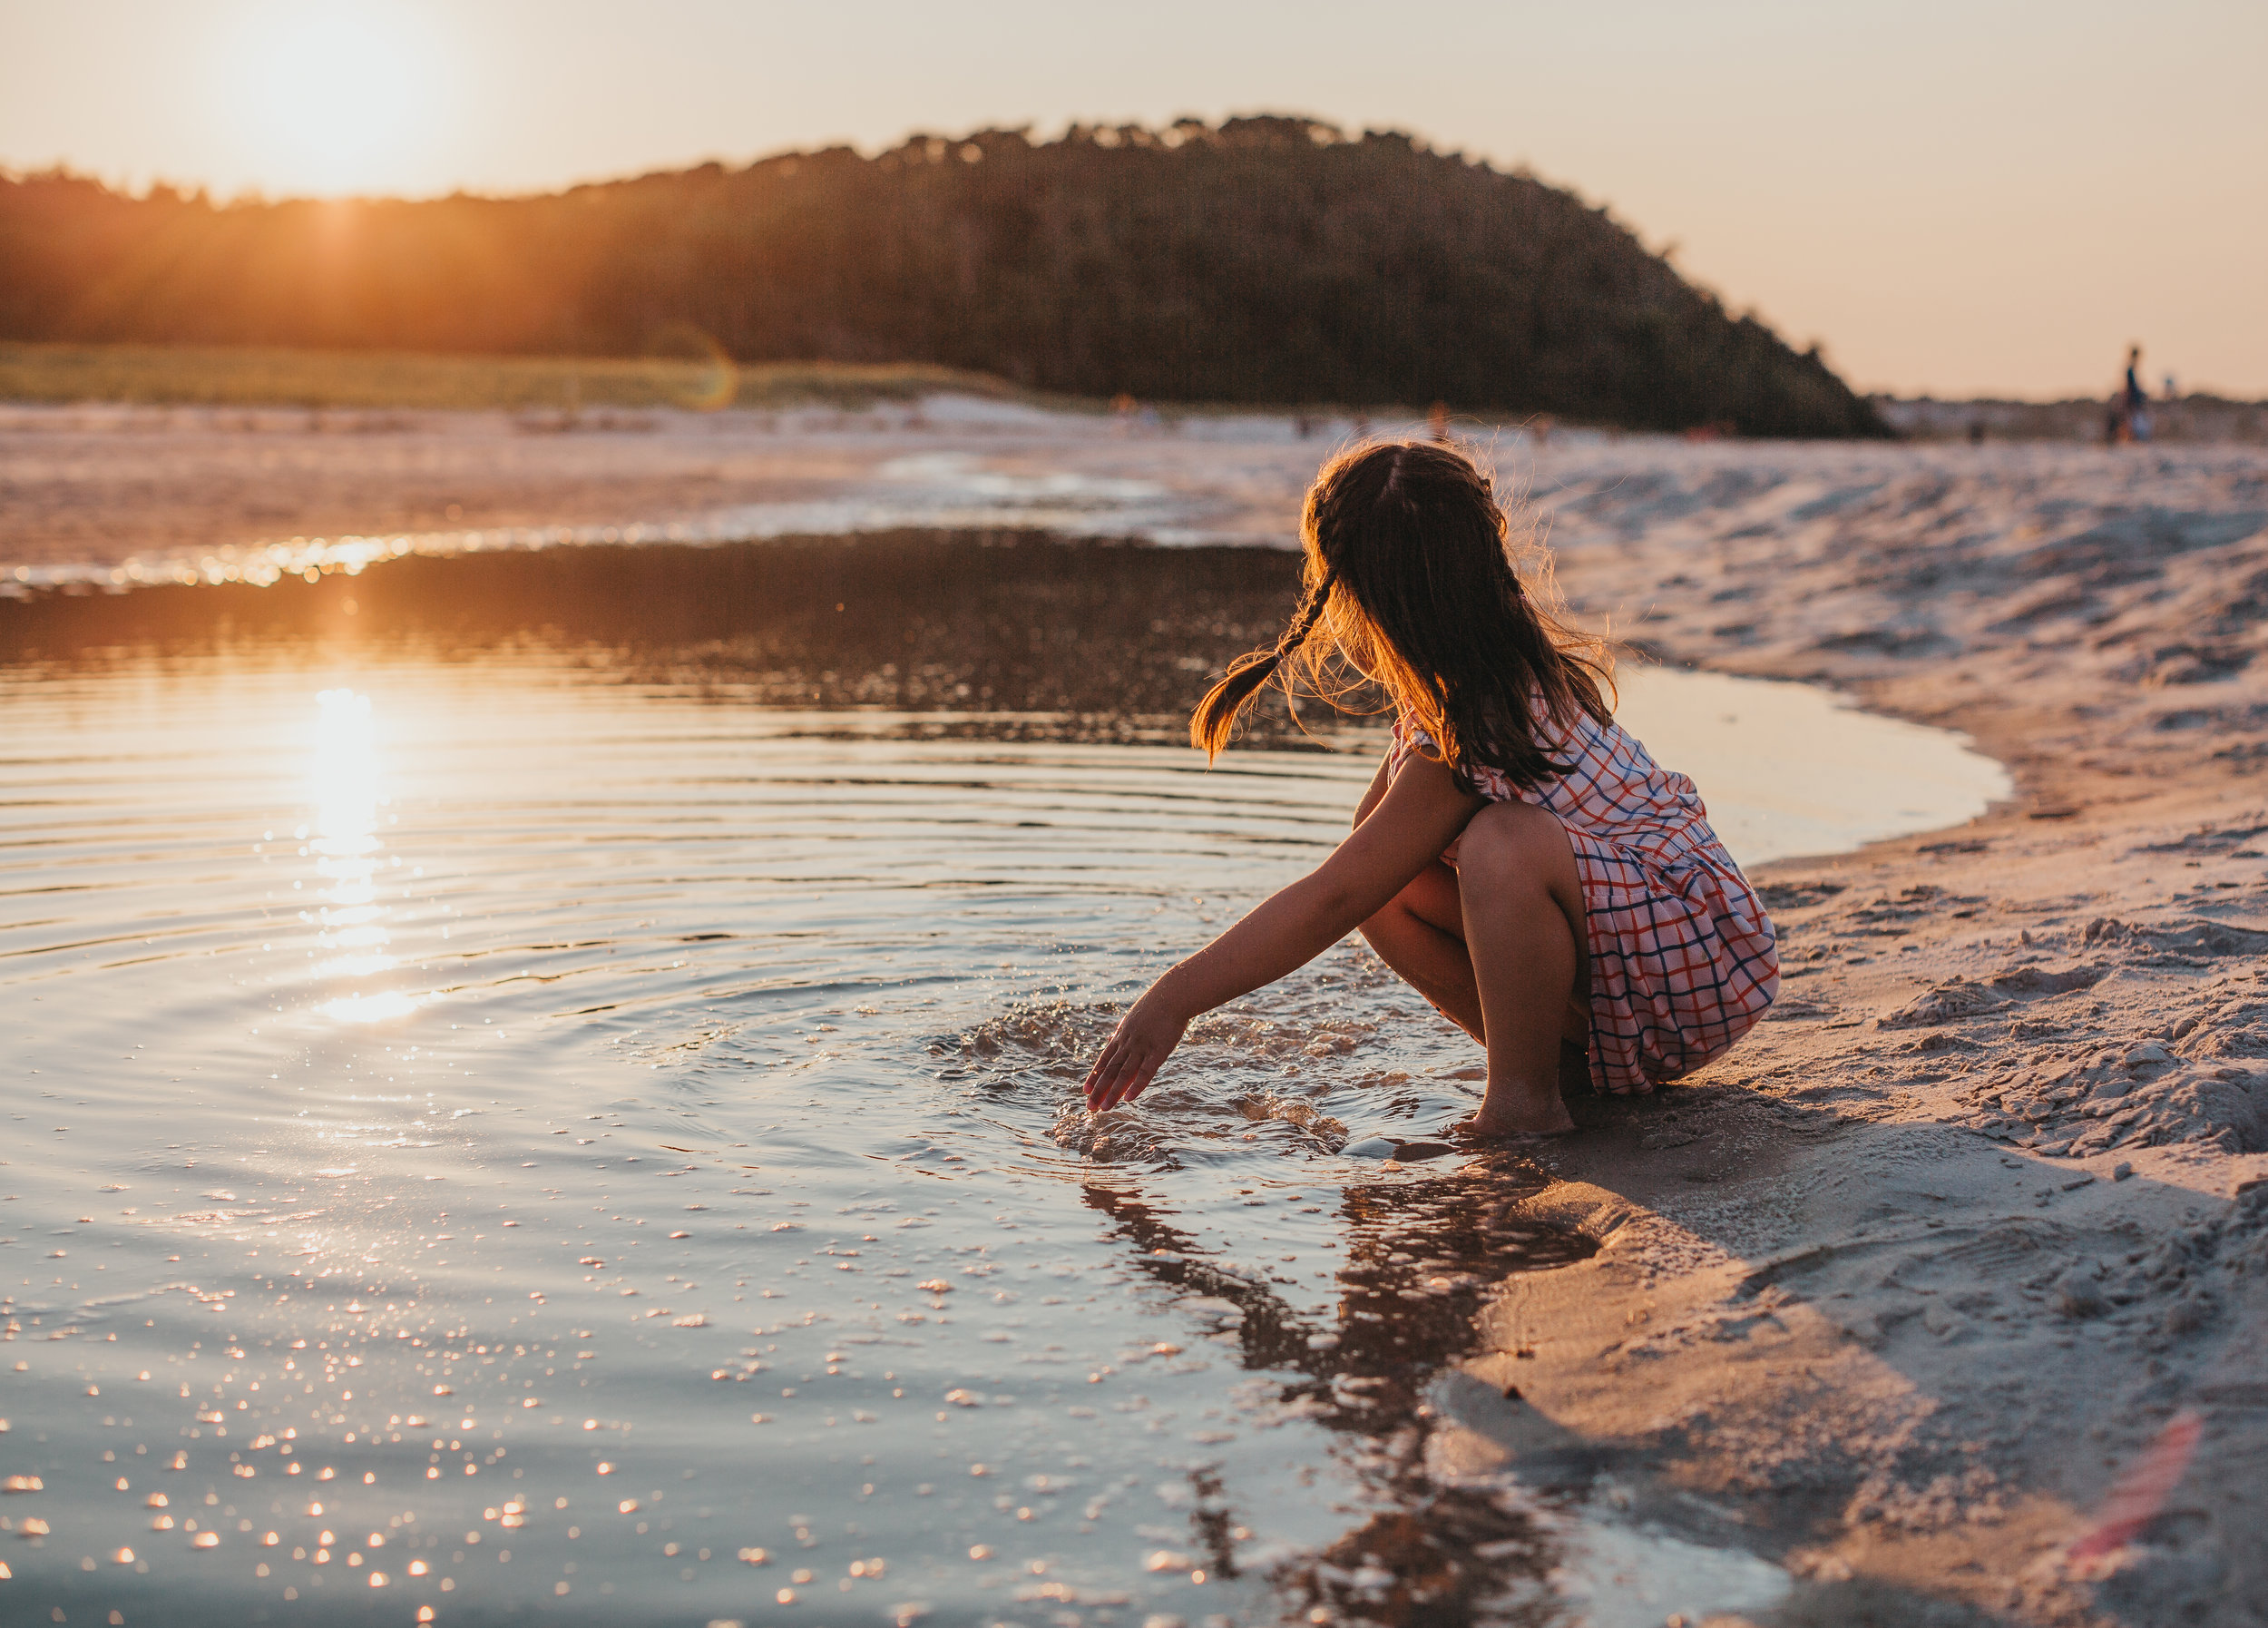 sunset-beach-family-portraits-boston-family-photographer-joy-leduc.jpg